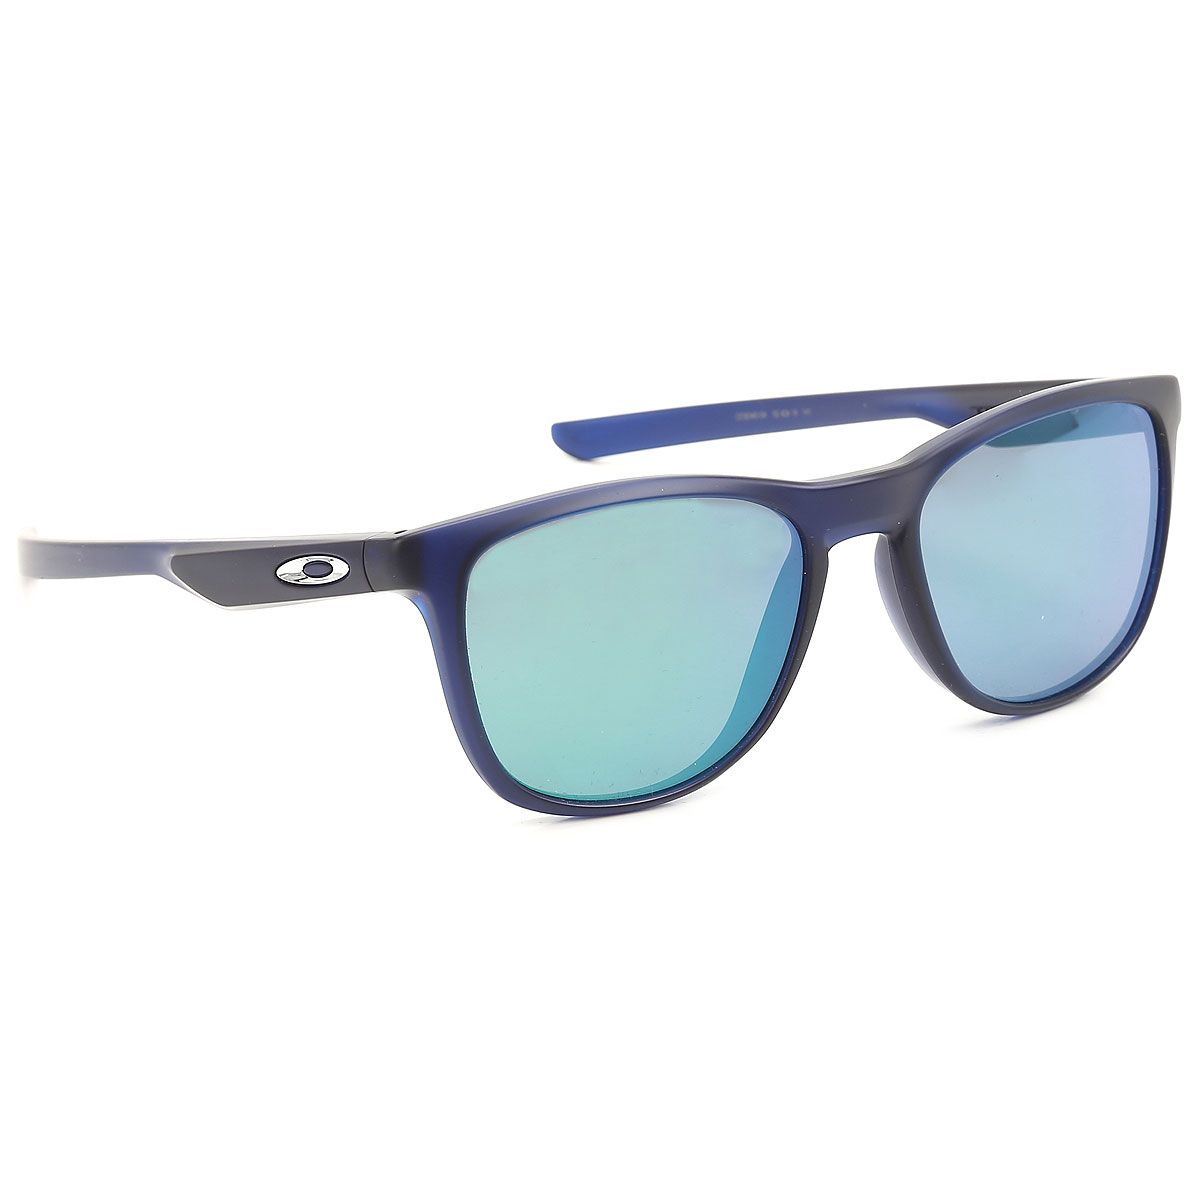 Oakley Sunglasses On Sale, Matt Blue, 2019